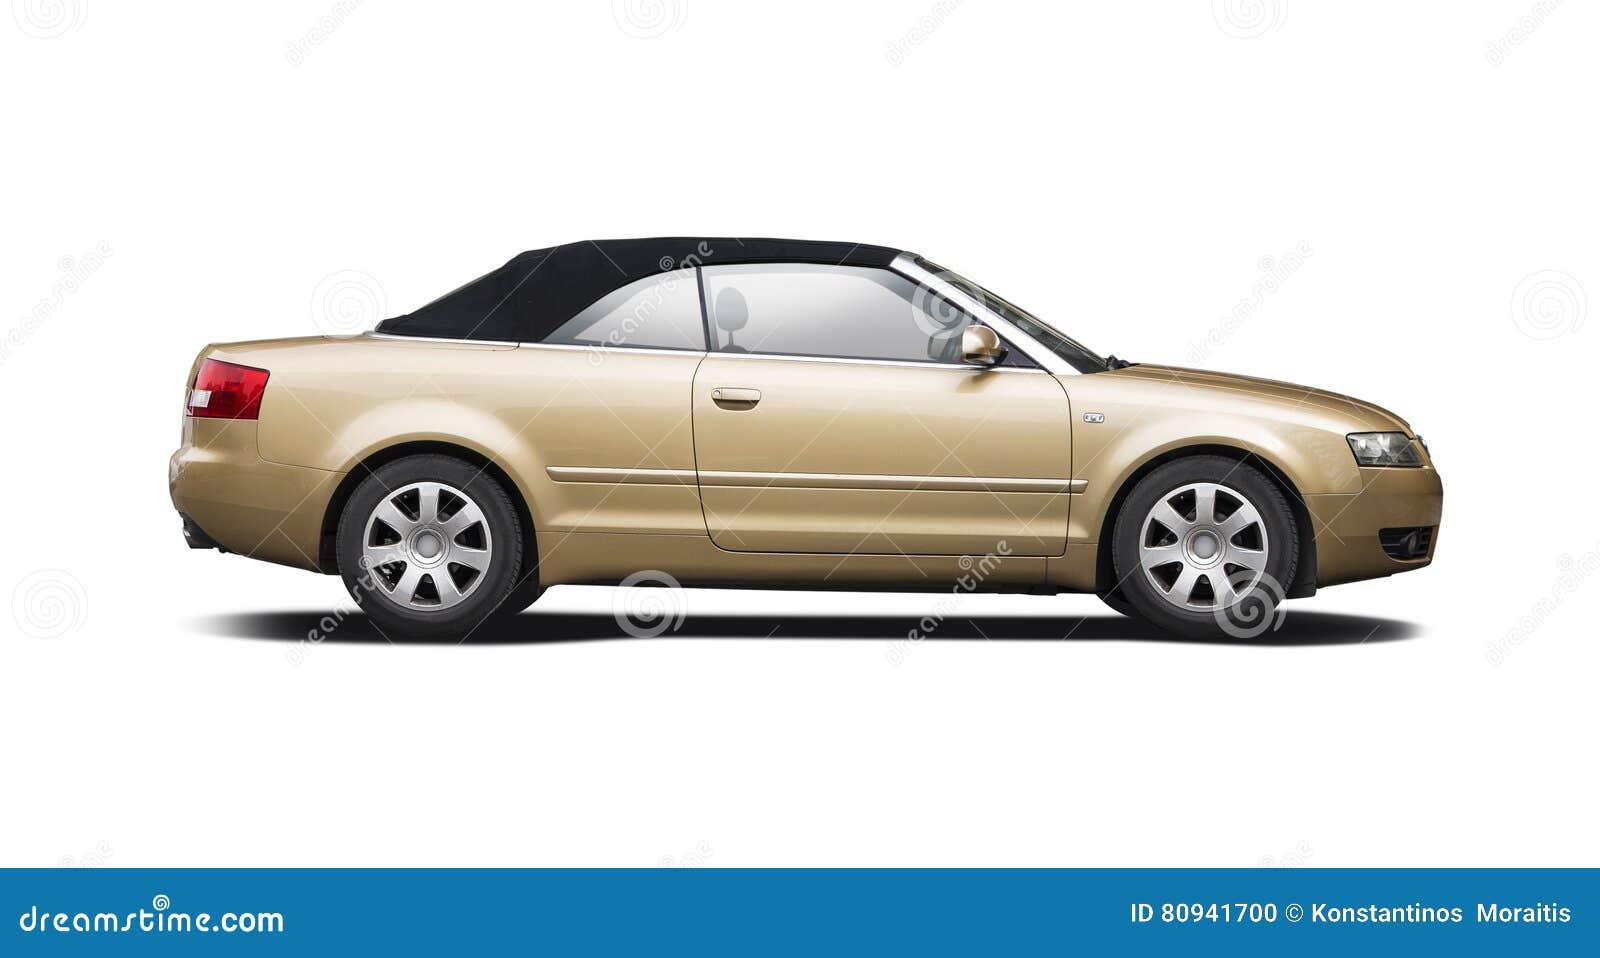 Audi A4 Cabrio Stock Photo Image Of Side View Auto 80941700